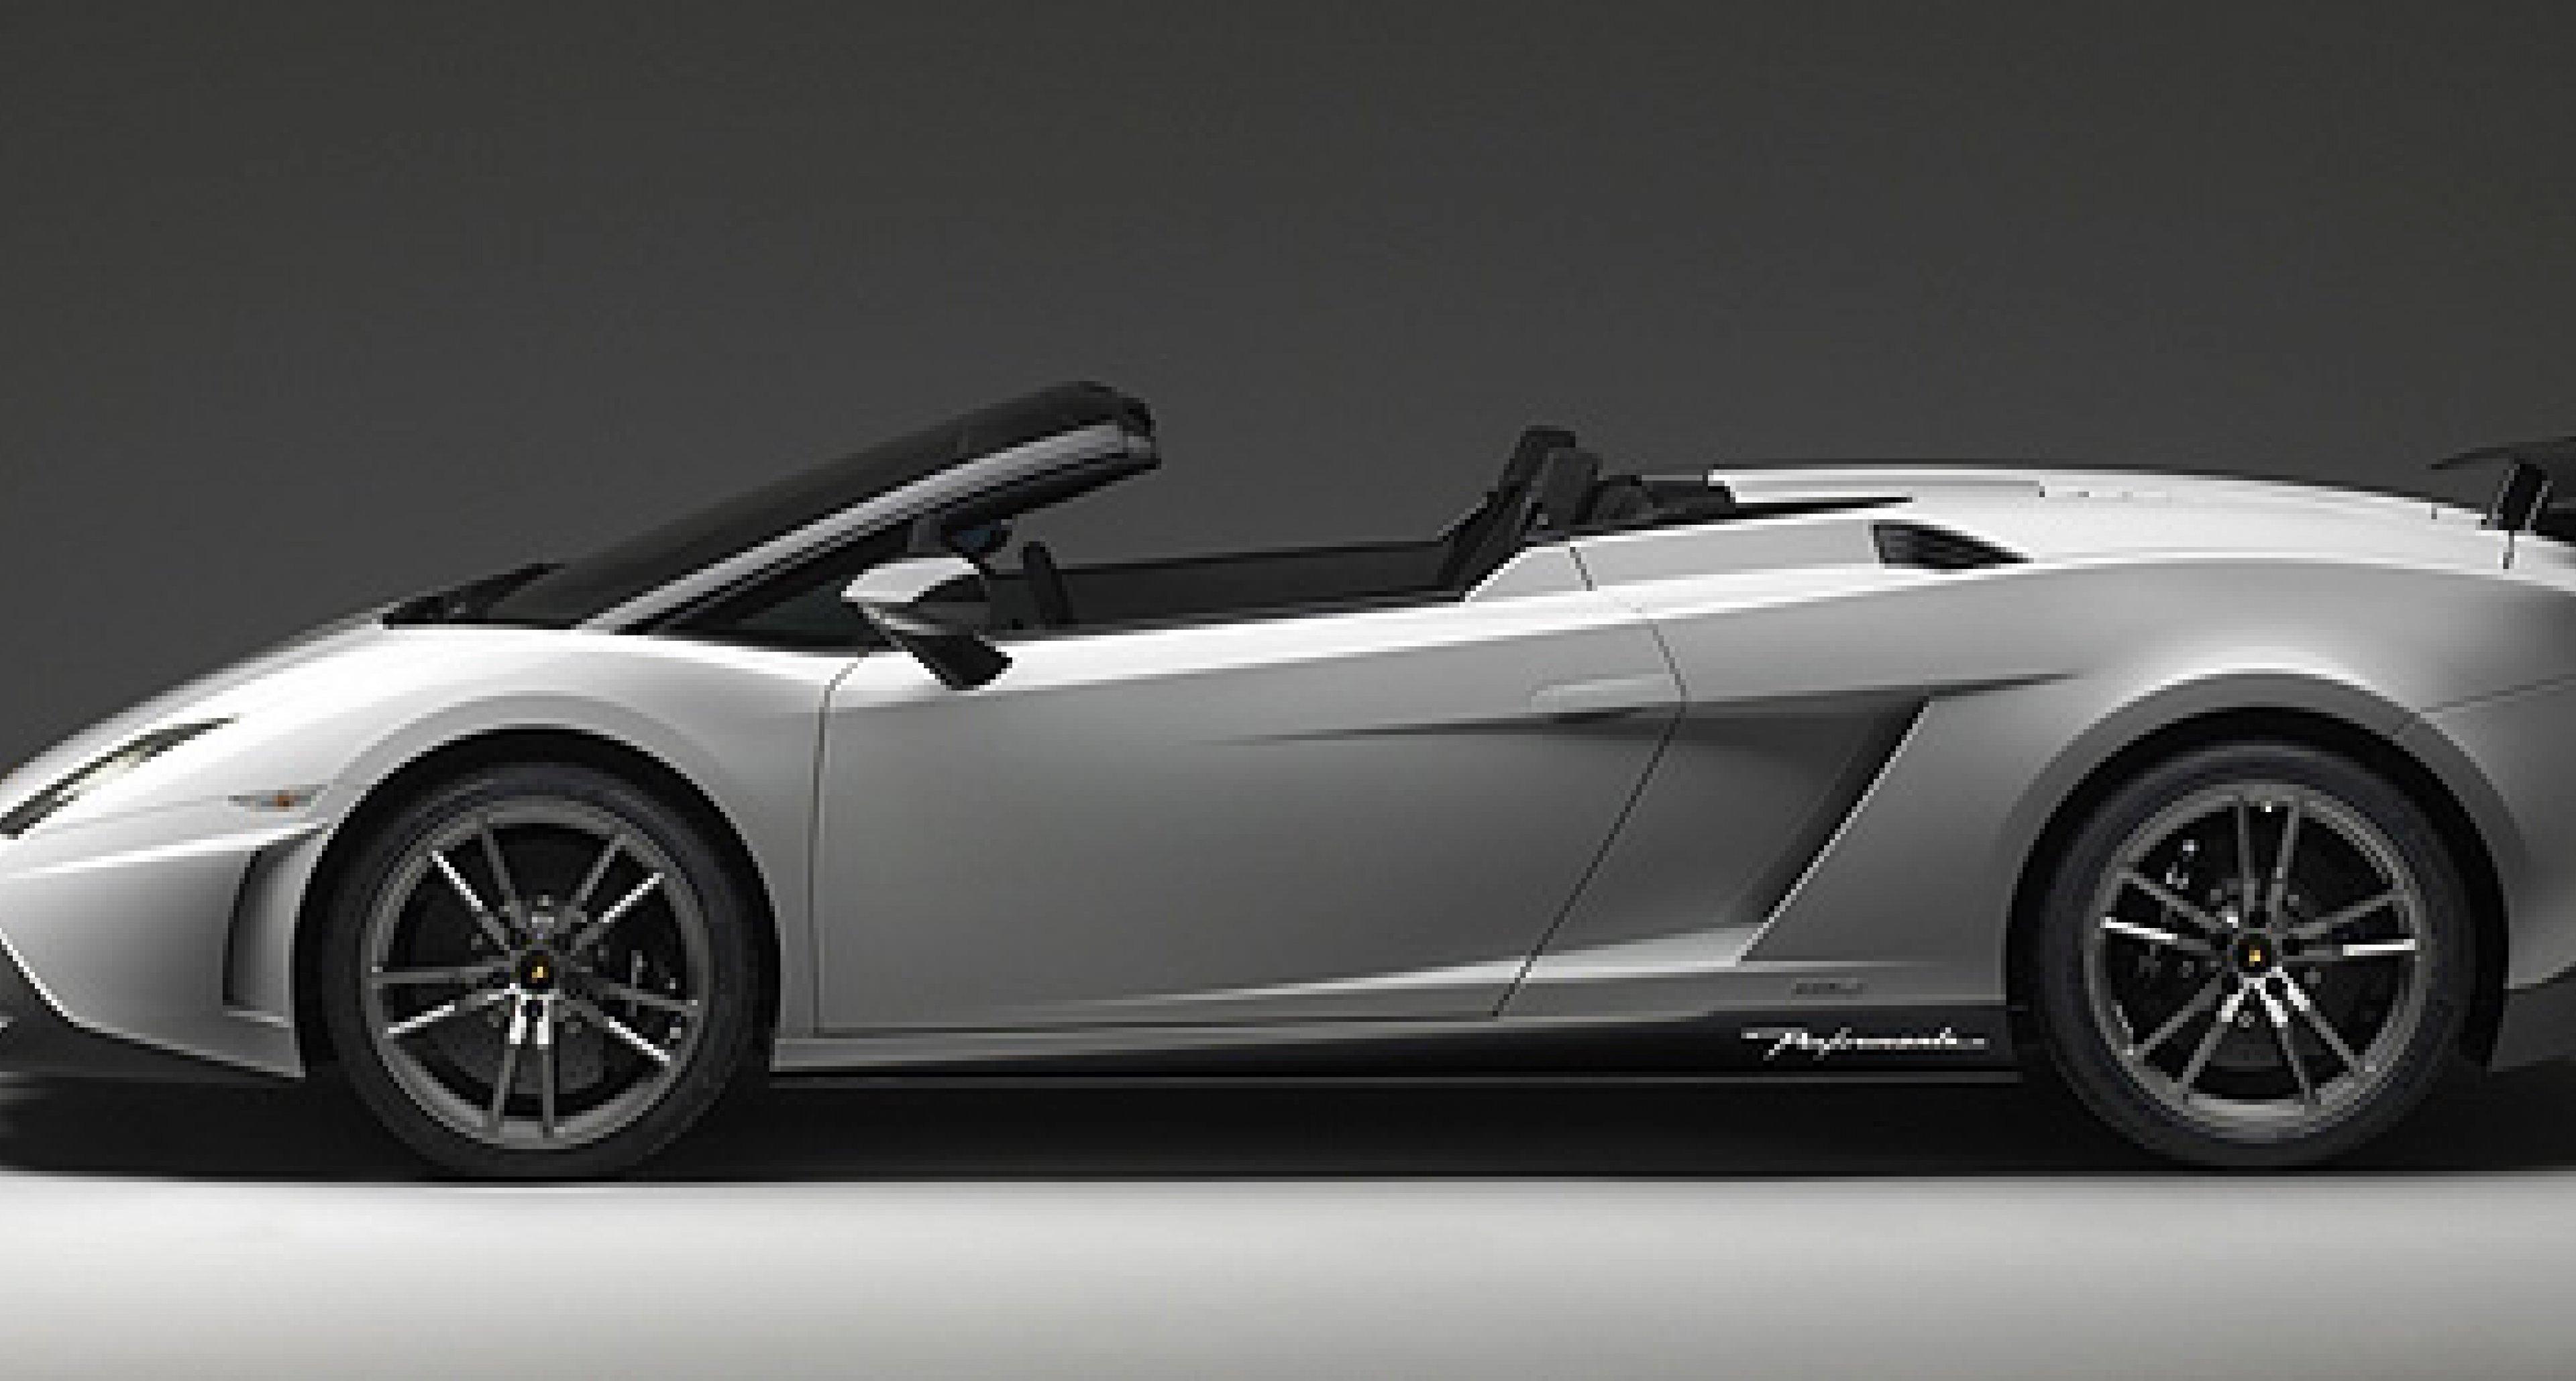 Lamborghini Gallardo LP 570-4 Spyder Performante: Offener Superleggera